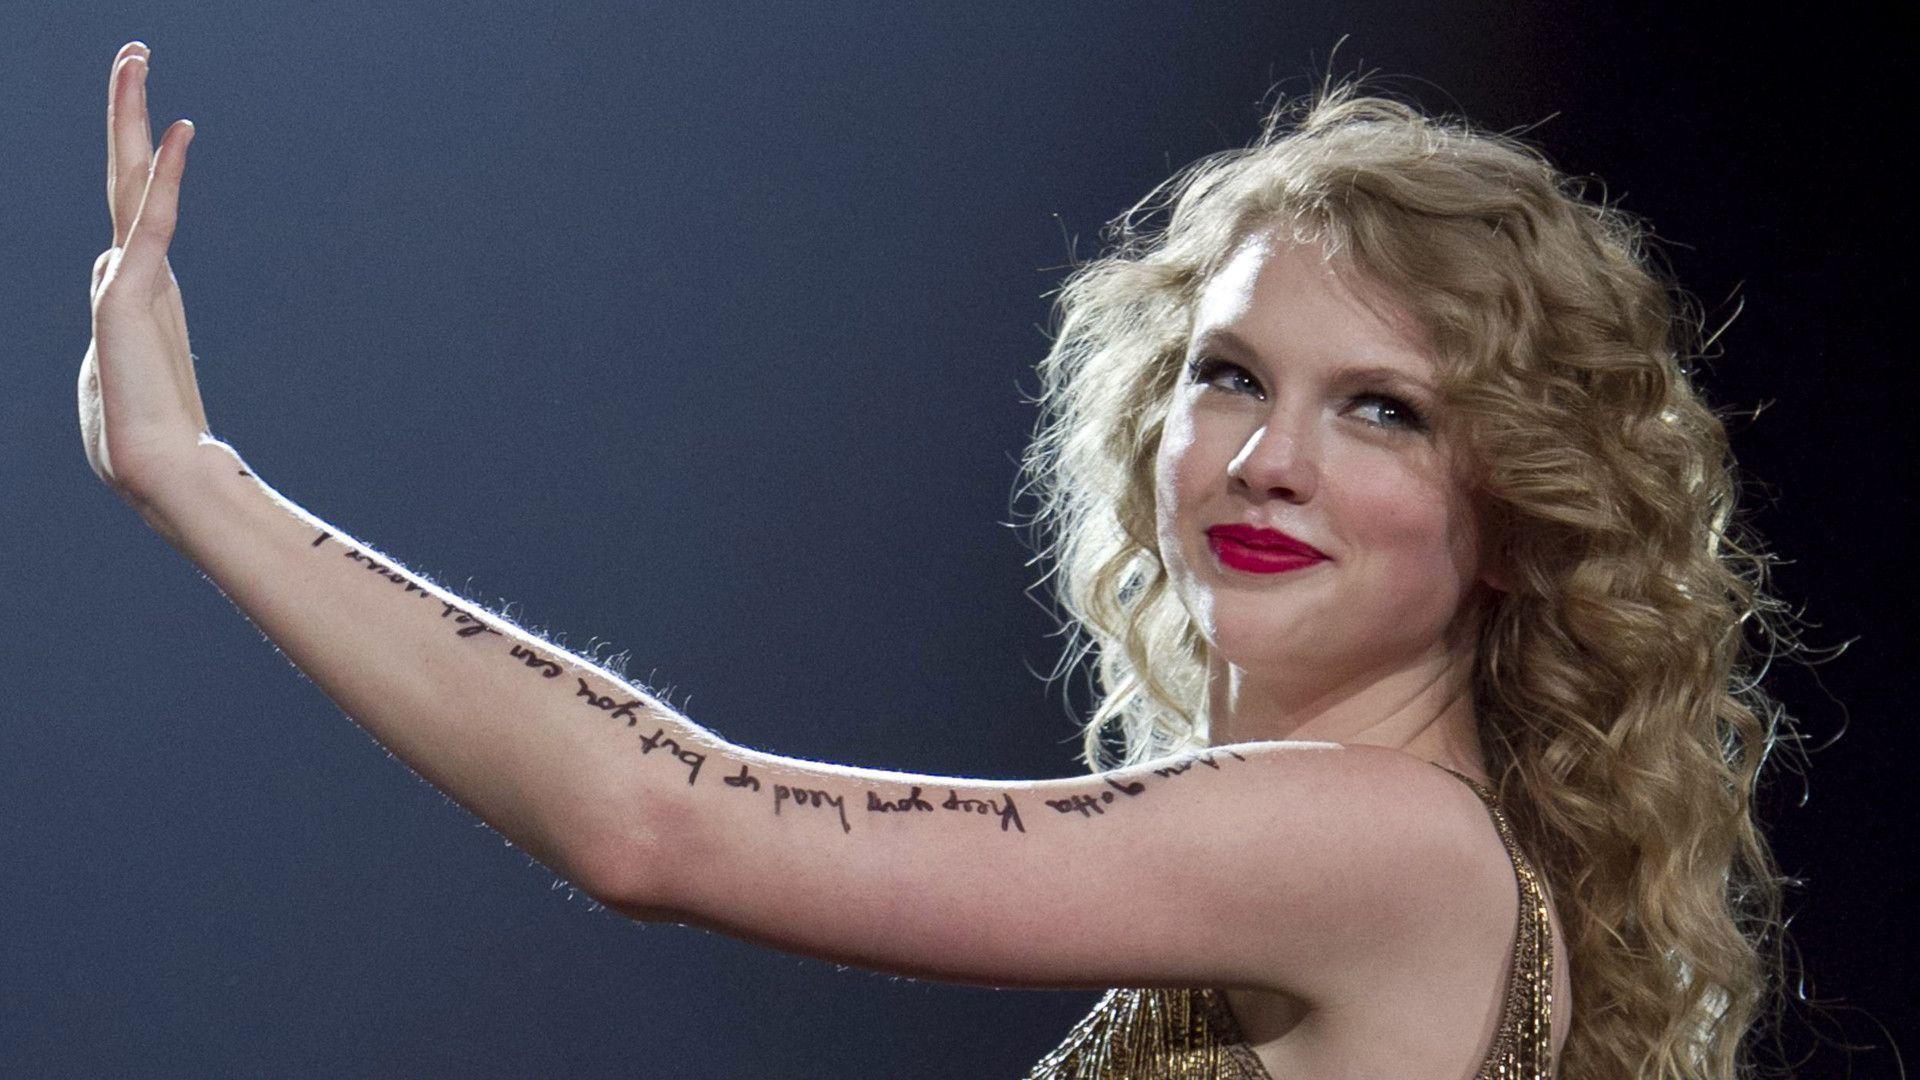 Taylor Swift Speak Now Wallpapers Wallpaper Cave